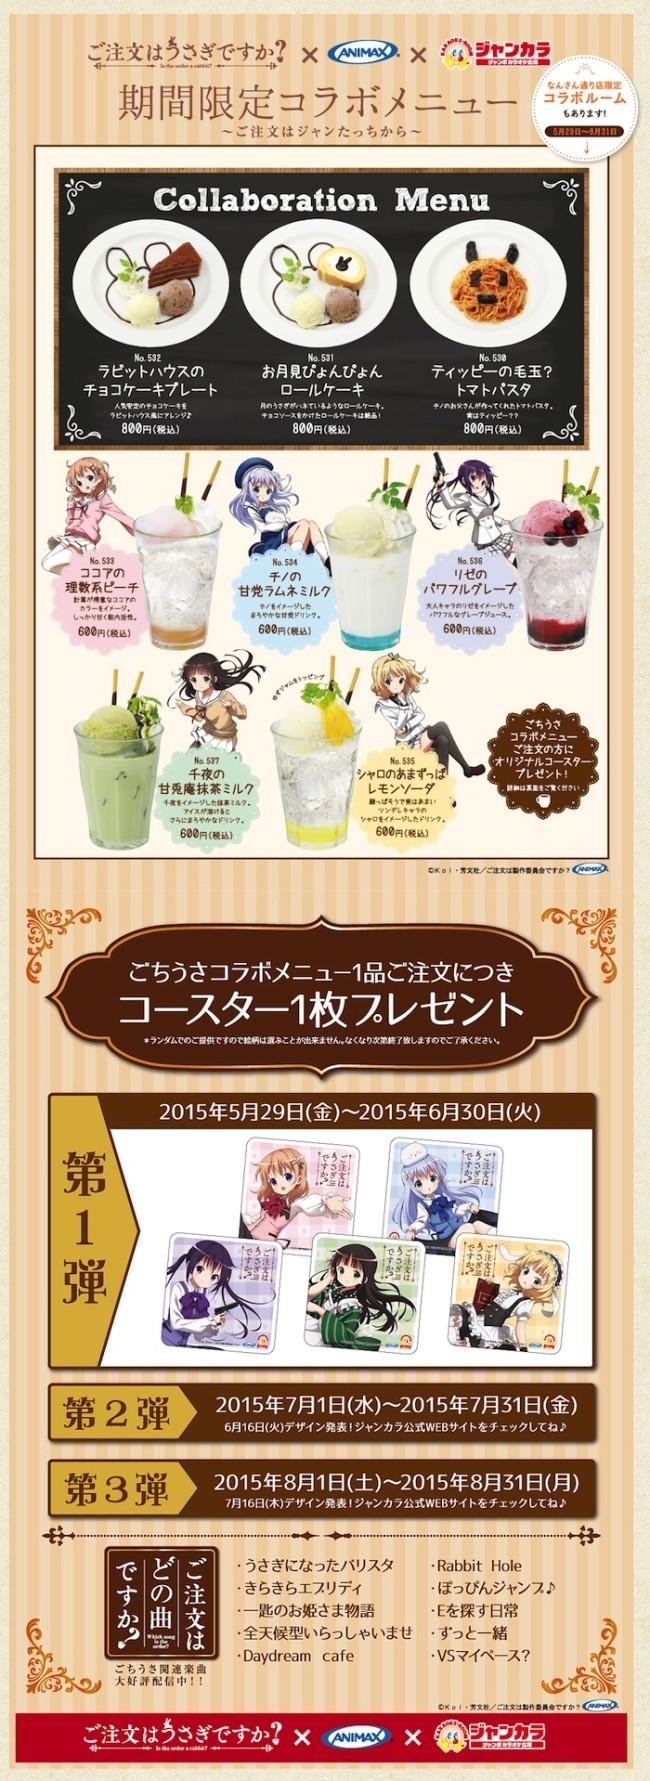 screencapture-jankara-ne-jp-campaign-gochiusa-1432880877540 のコピー